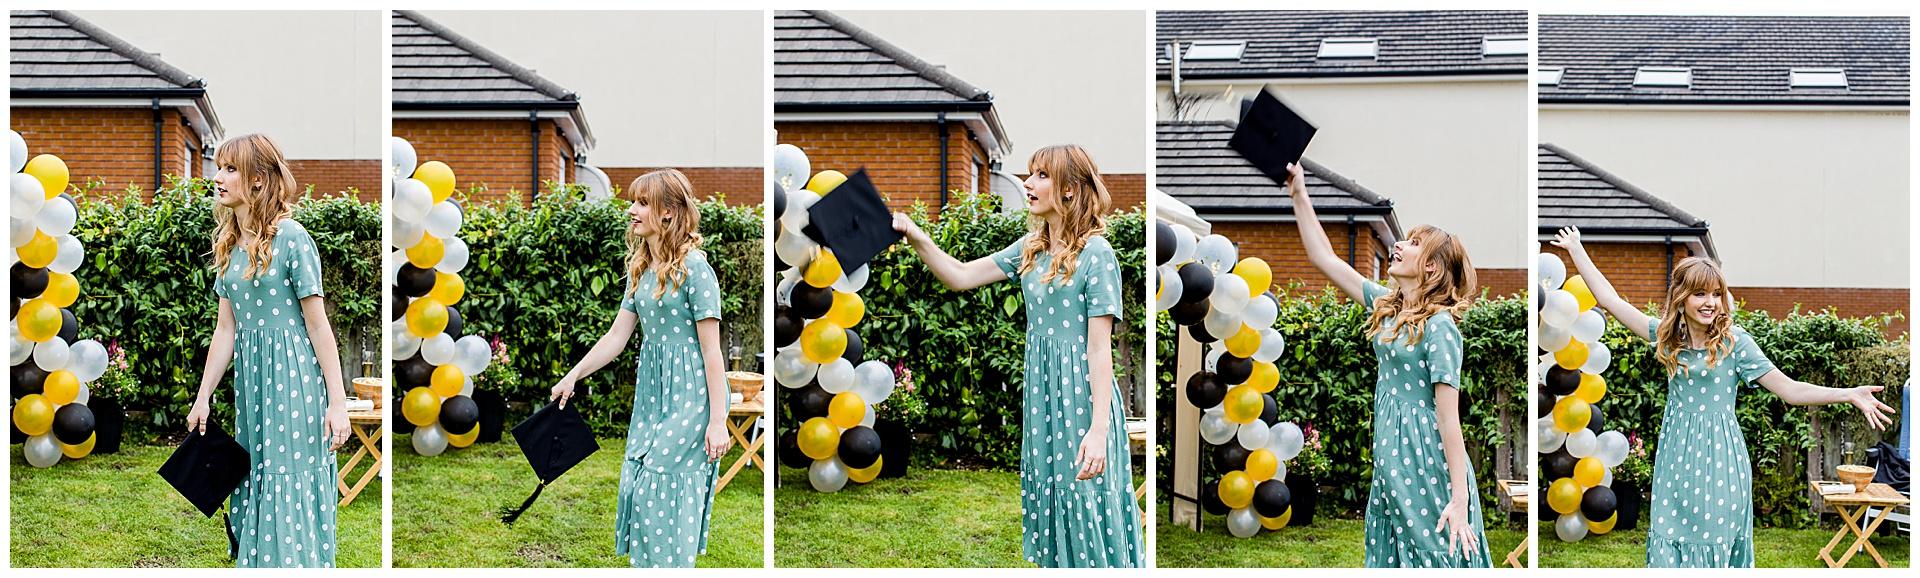 series of photos of female graduate throwing cap in the air